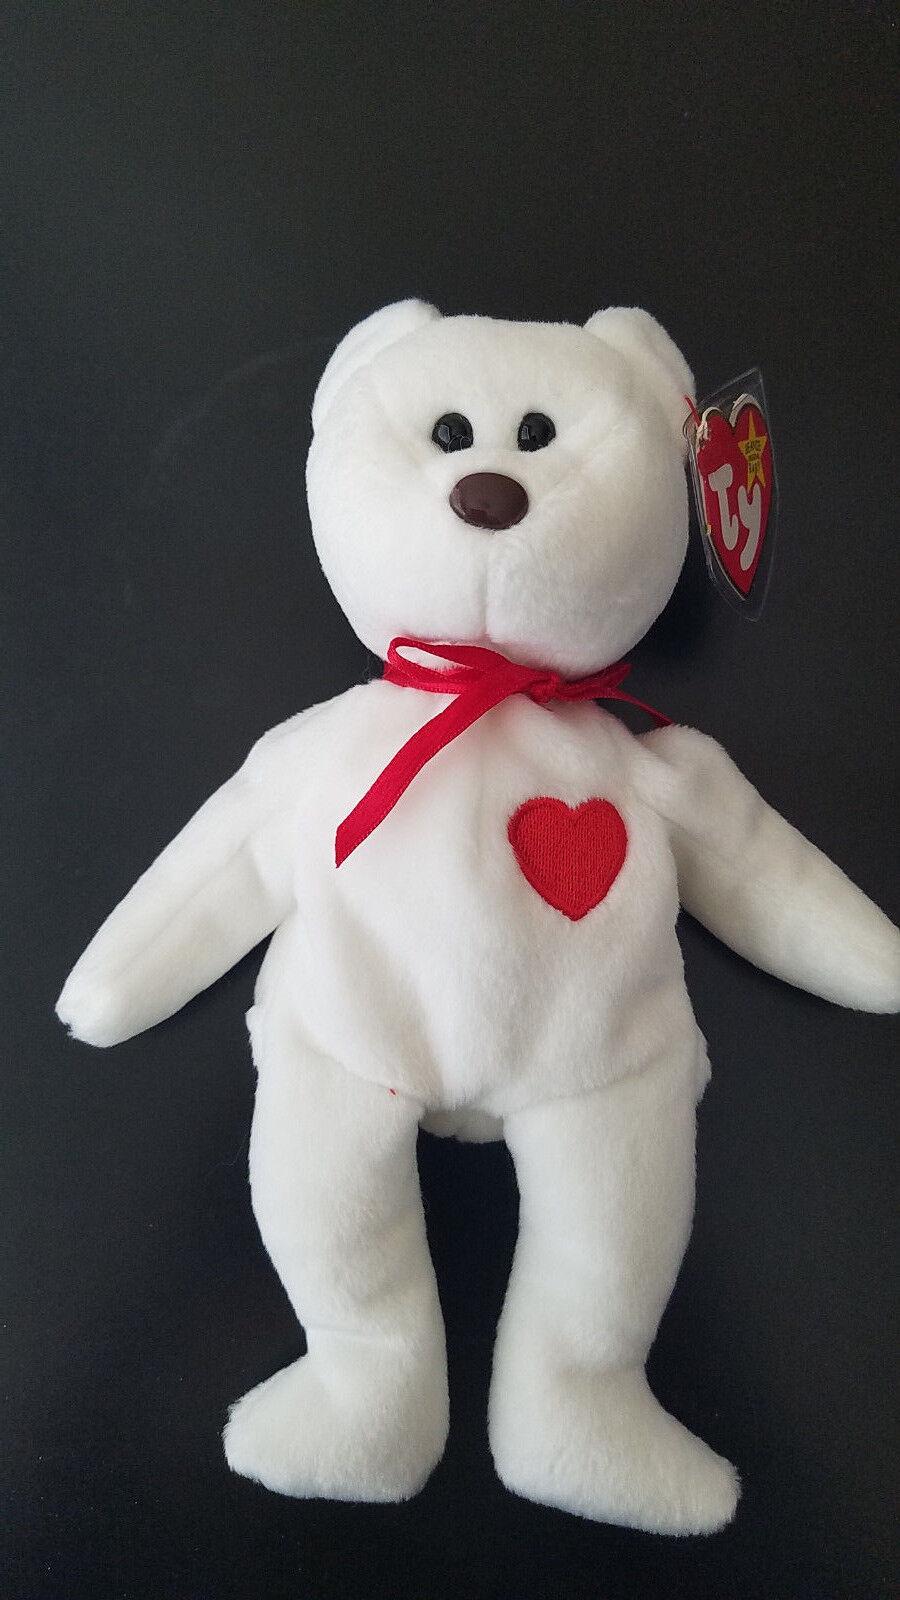 Lot of 9 TY Beanie Beanie Beanie Babies Bears Osito Erin Wallace Curley Cashew Fuzz Valentino 7a1bb8